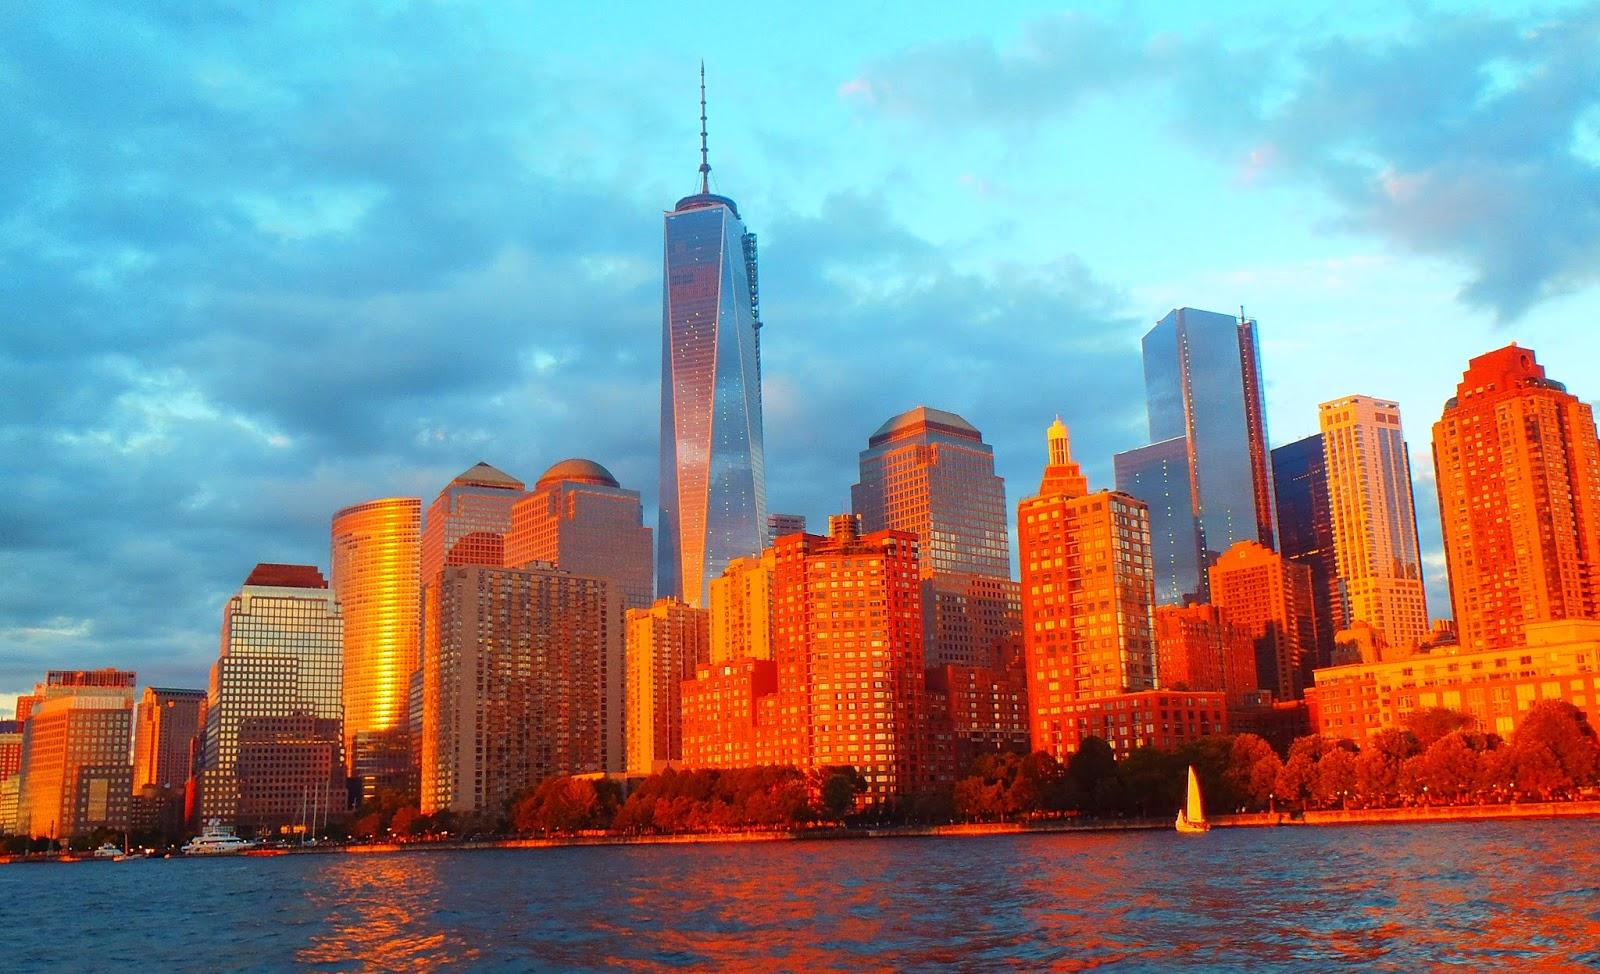 The sun setting on NYC Skyline